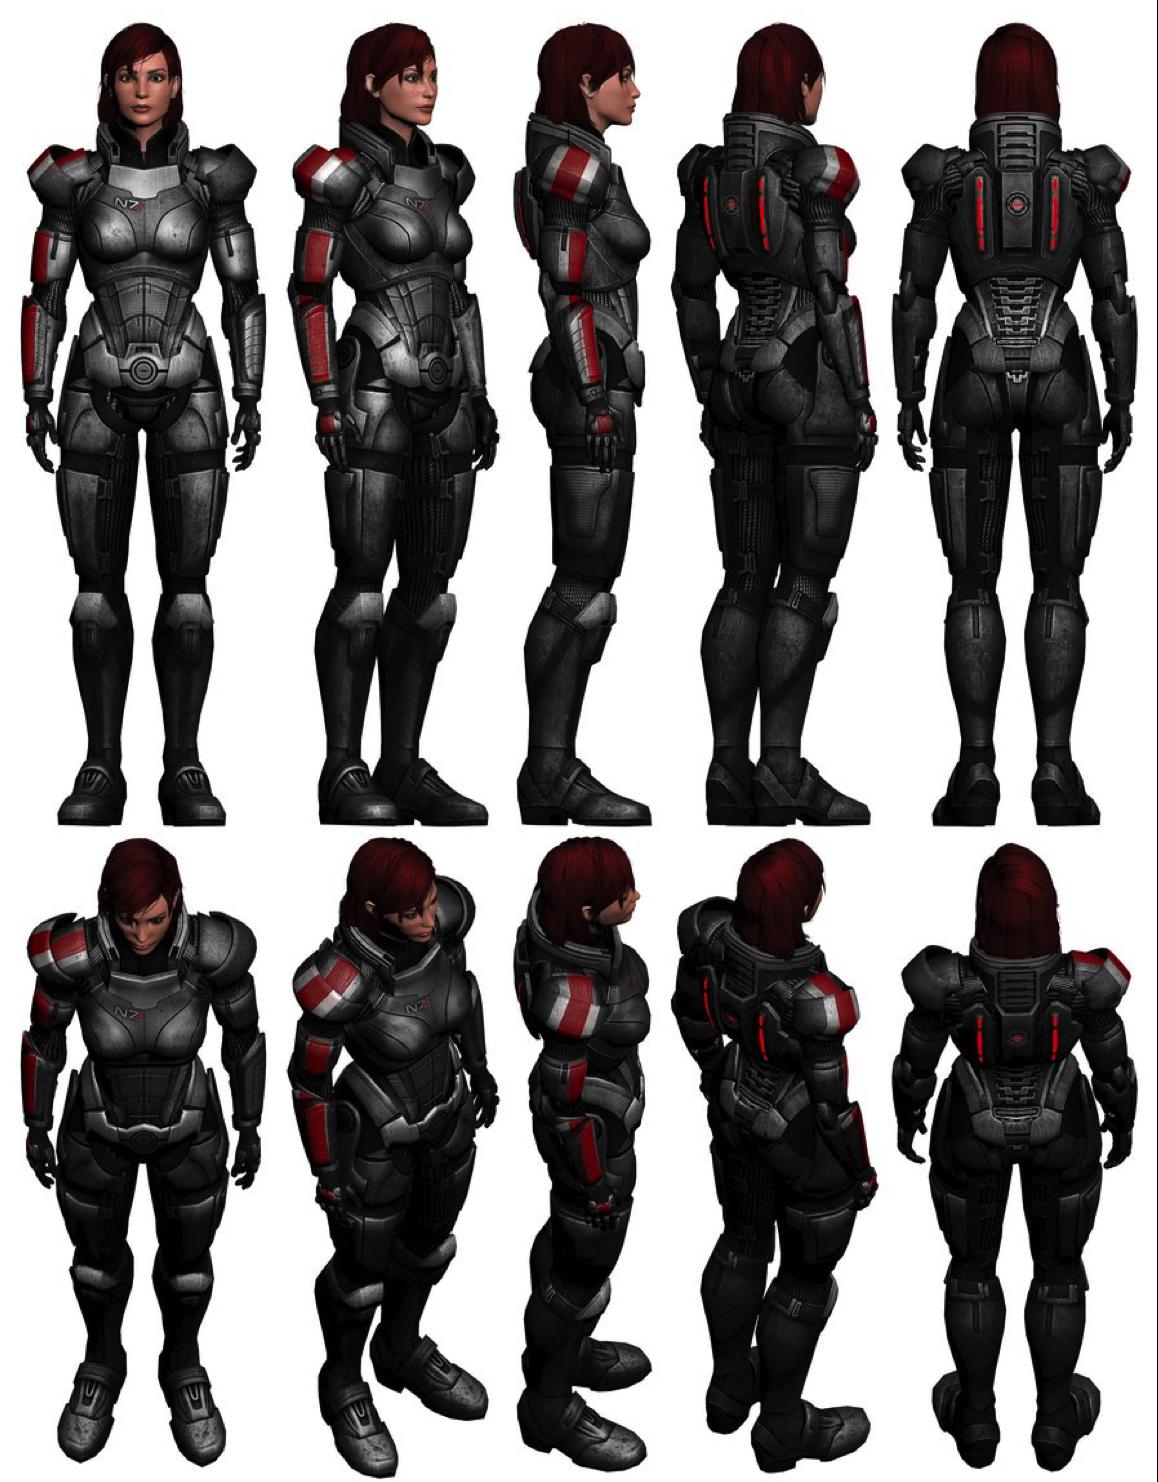 Mass Effect N7 Armor Build | CKCosplay